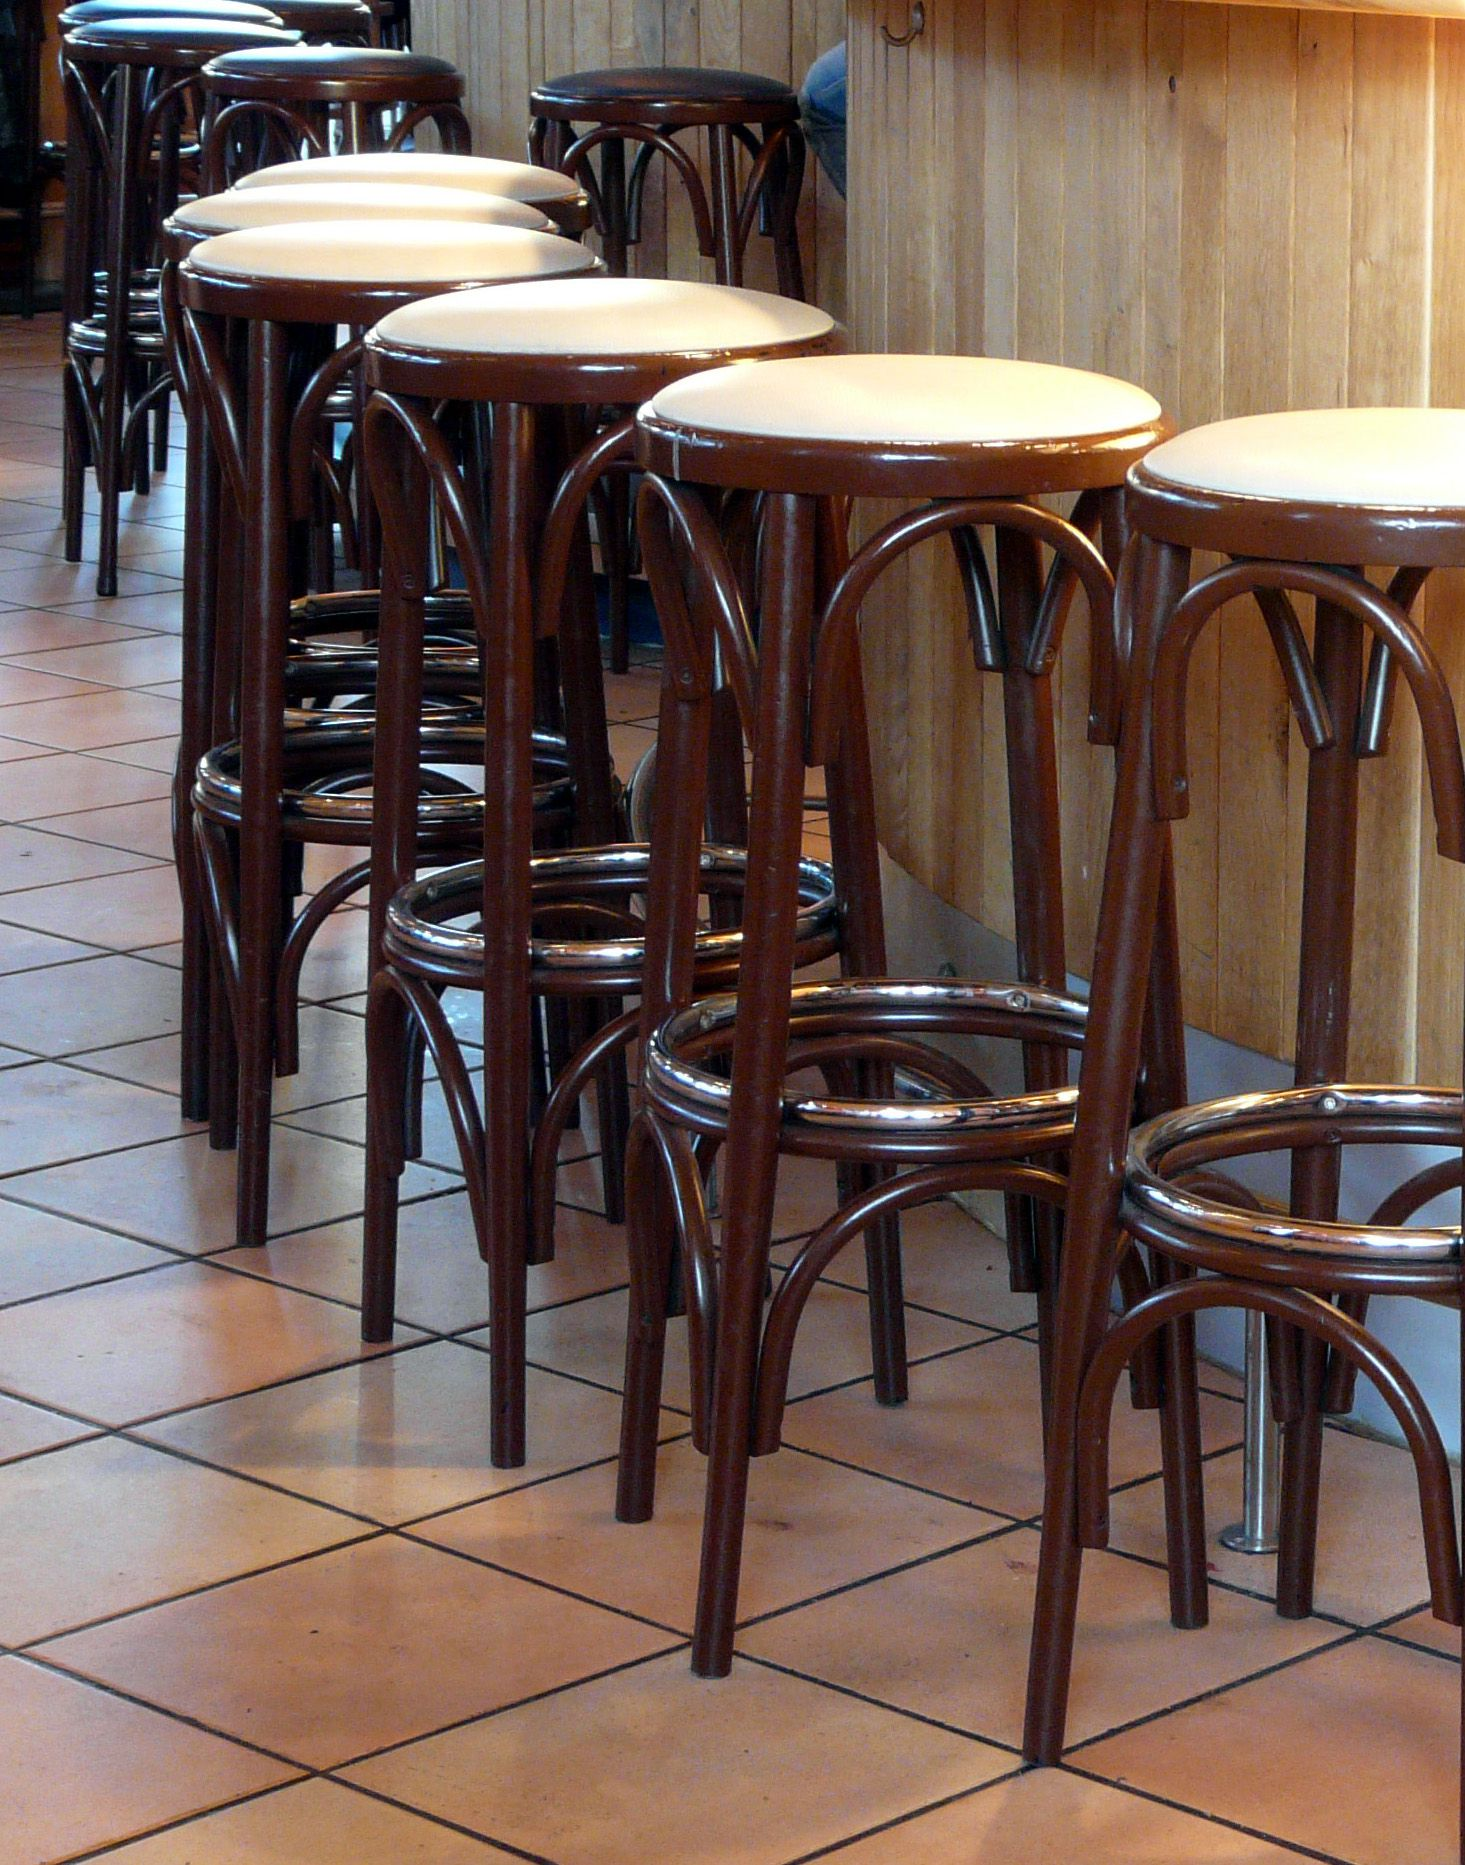 Kitchen bar stools, Designer bar stools, Bar furniture